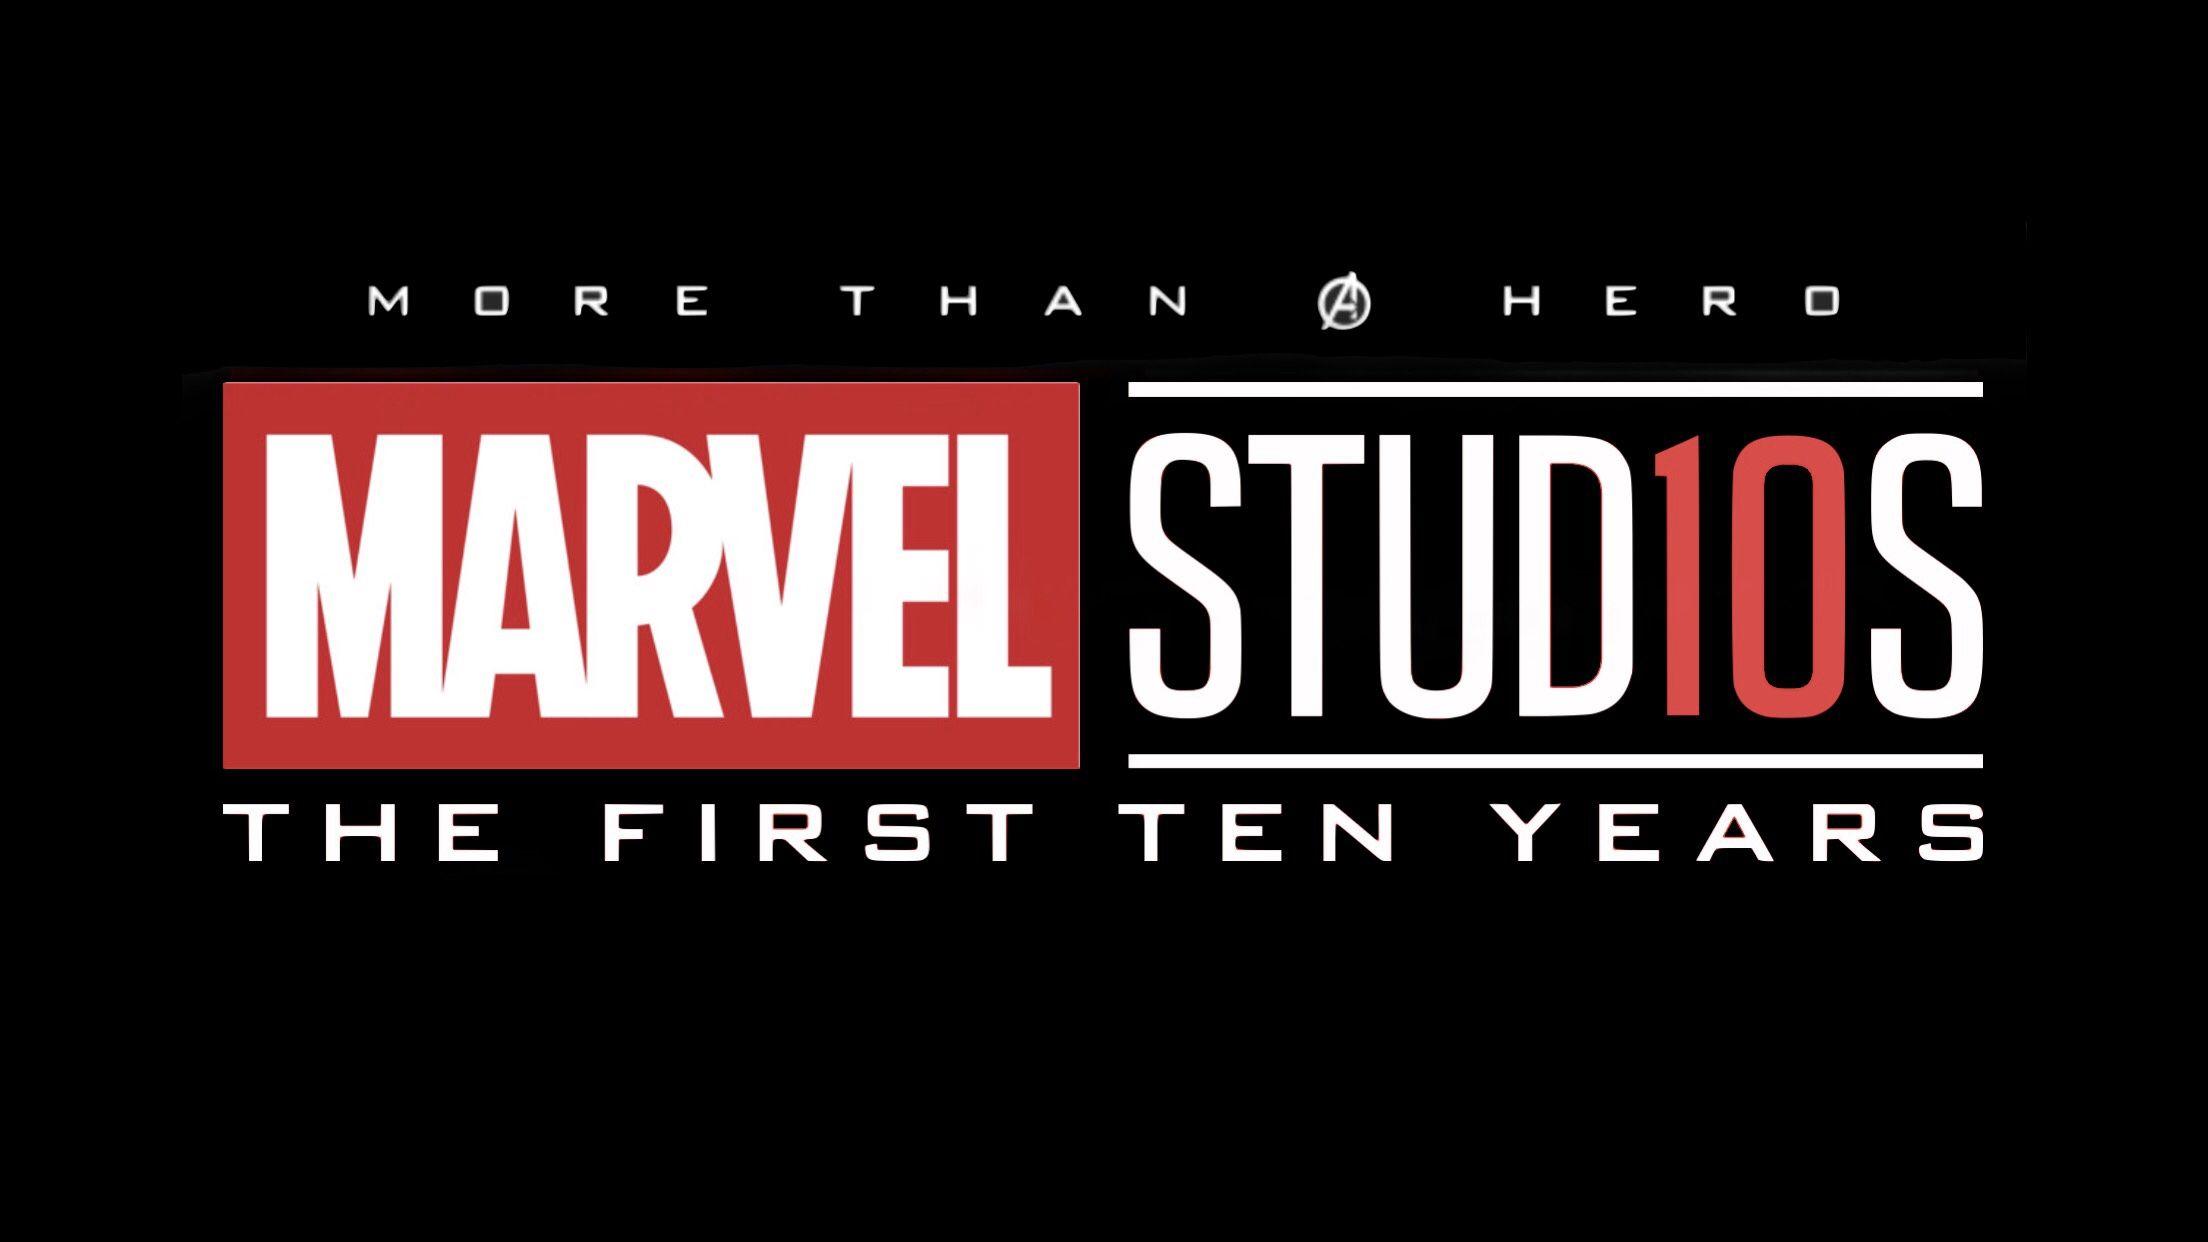 Marvel Studios: the First Ten Years Logo | Marvel studios logo, Marvel  superhero posters, Marvel studios